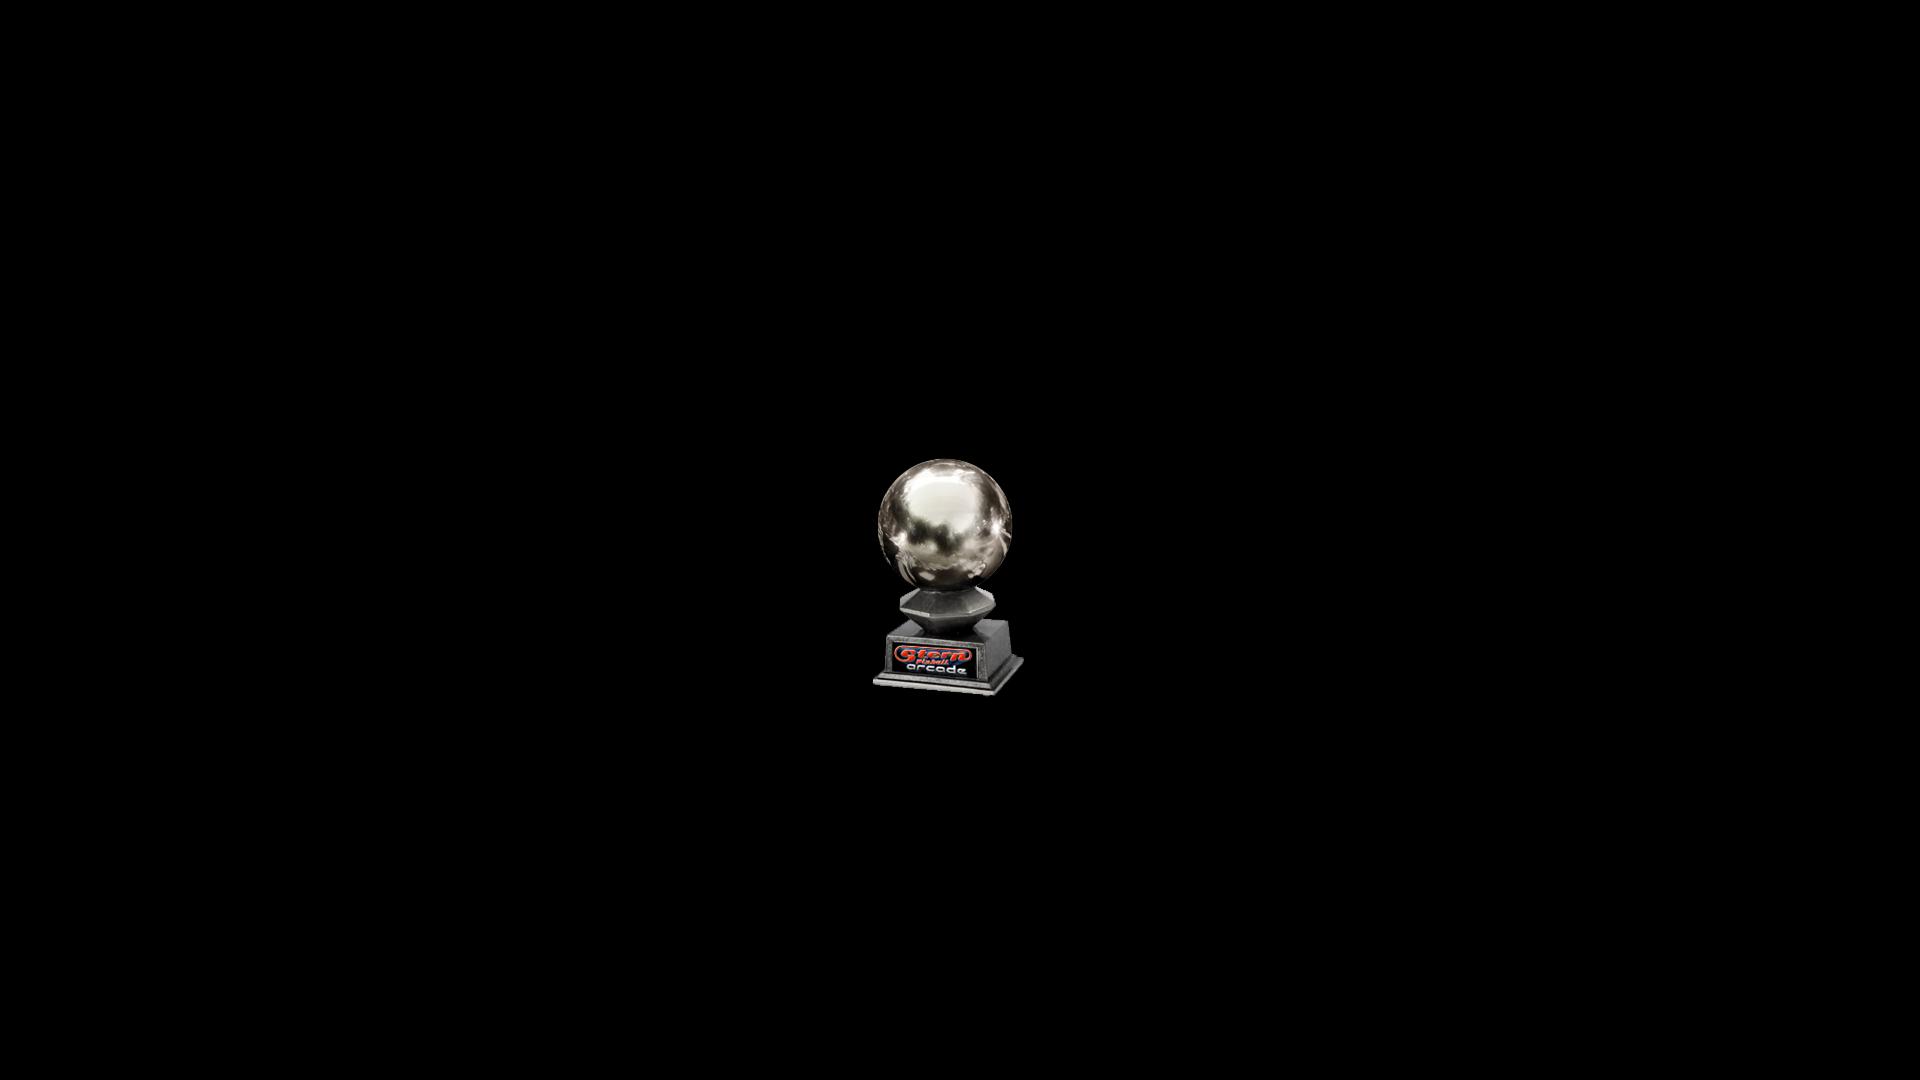 Star Trek Premium Score Champion